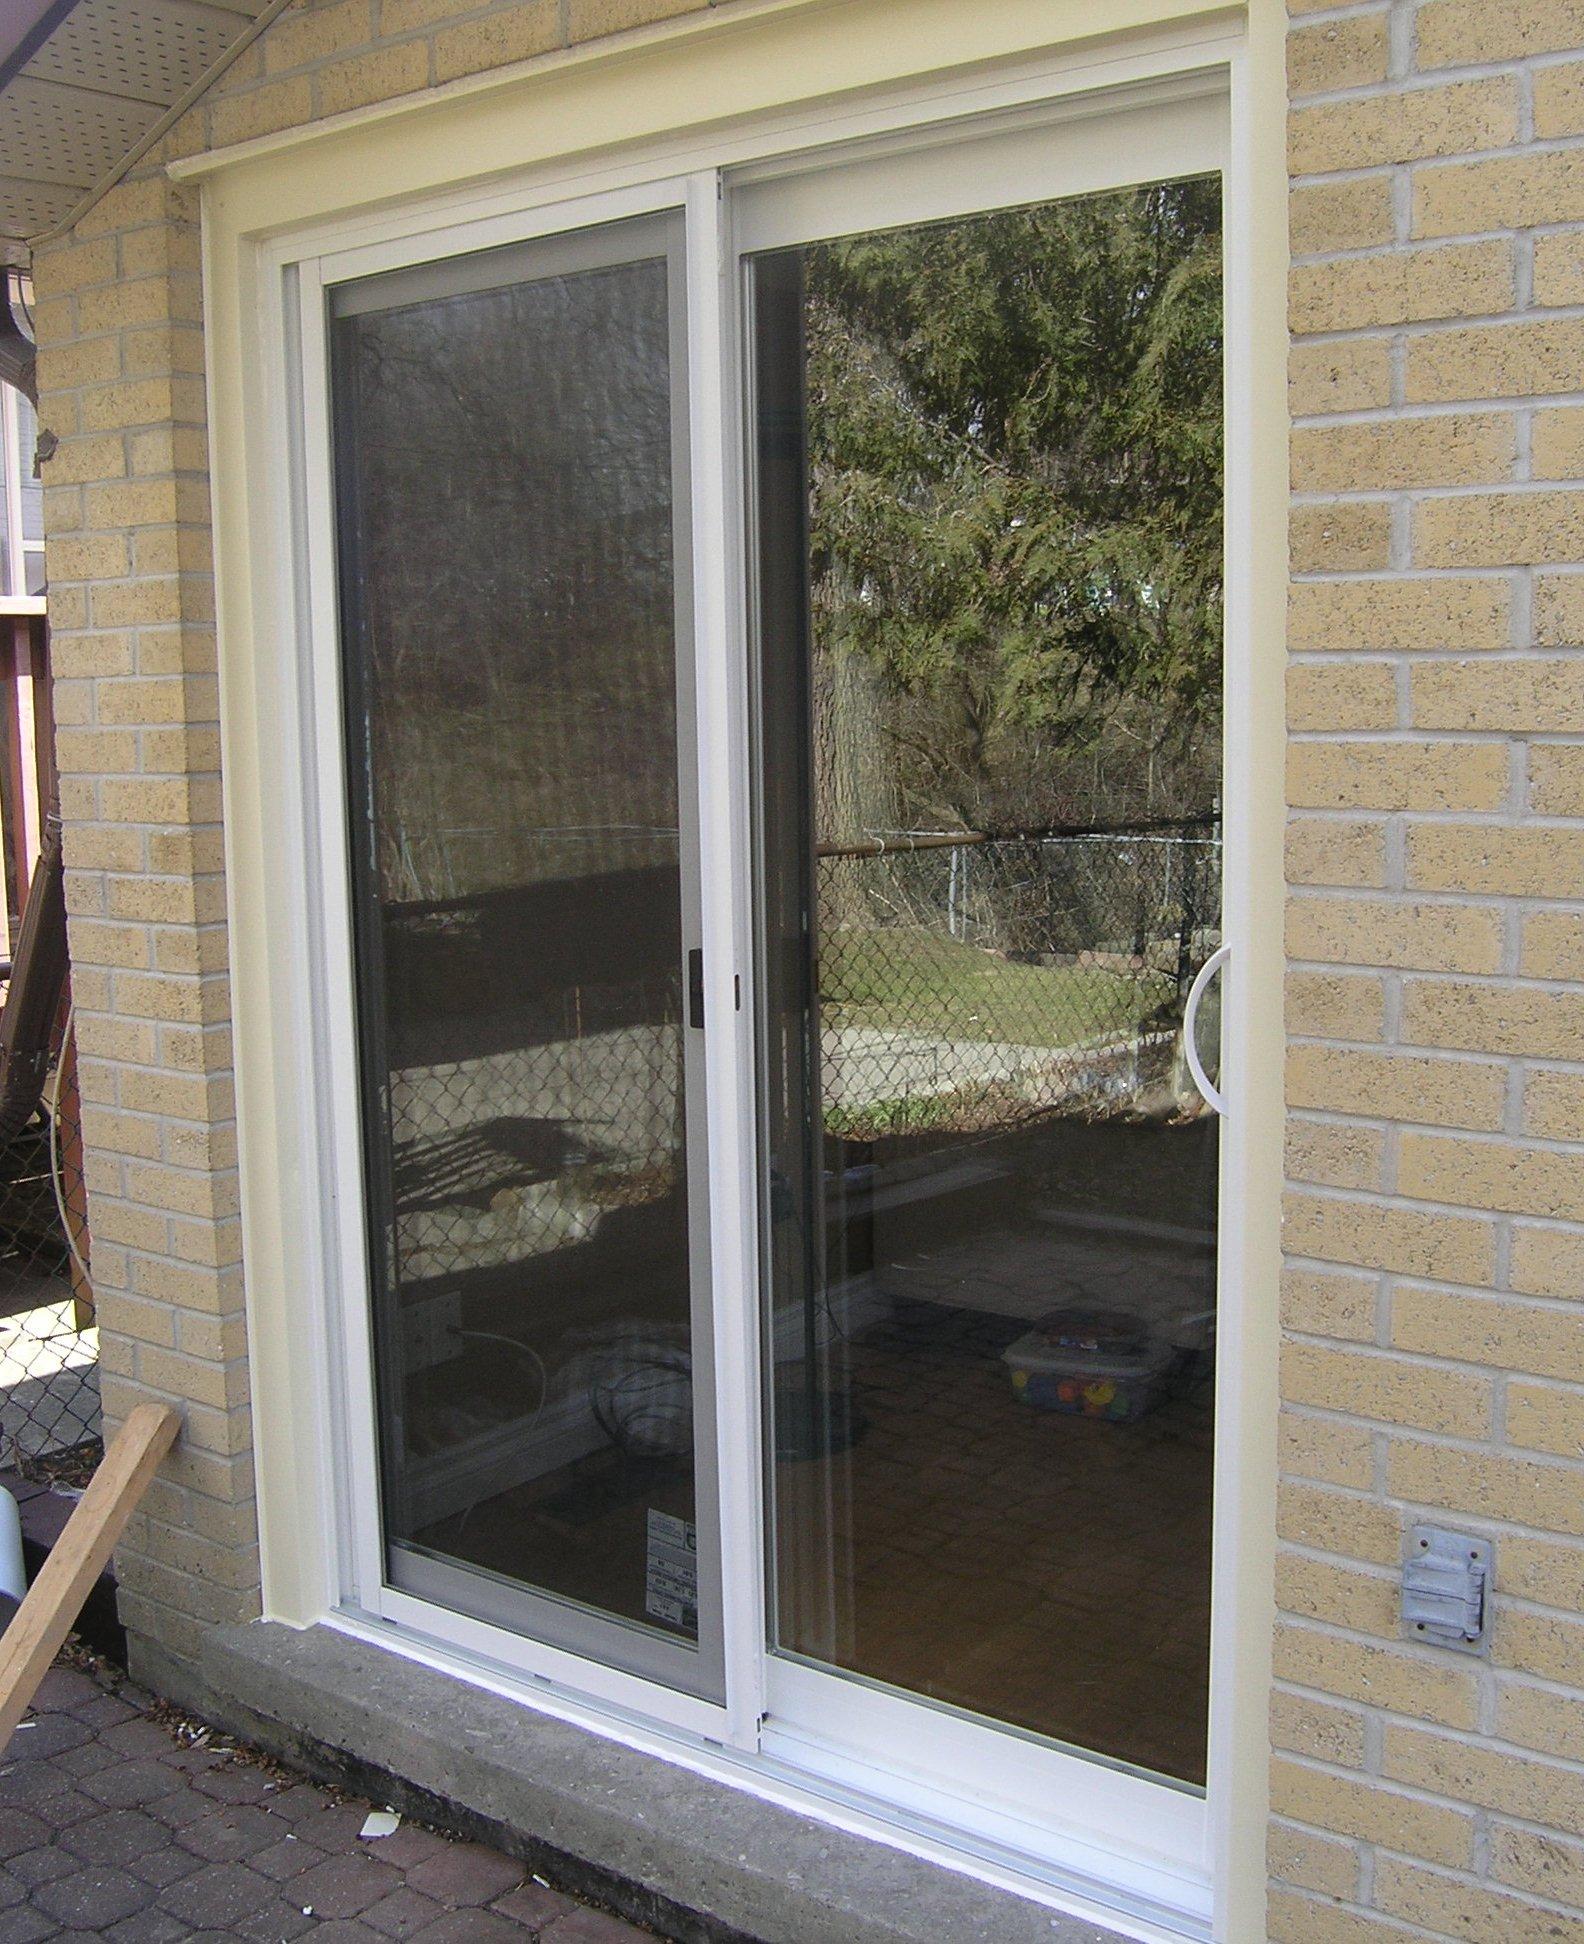 1944 #7C6B4F Windows And Patio Door Retrofit Installation And In Etobicoke Direct  pic Retrofit Patio Doors 11584